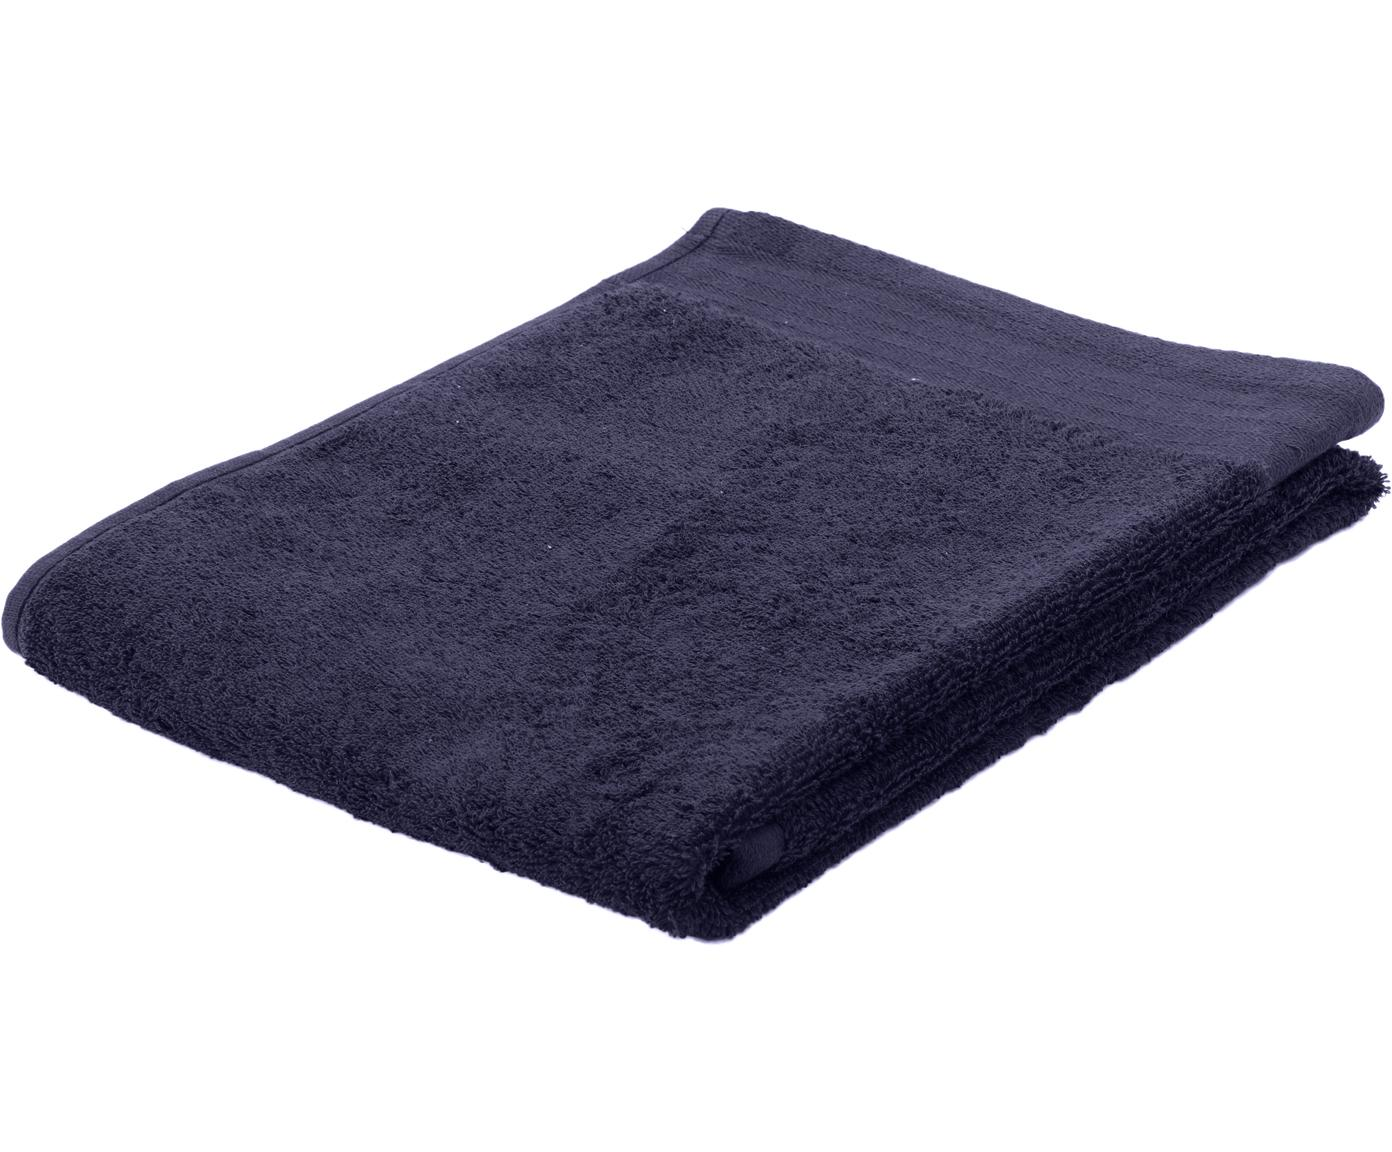 Asciugamano Soft Cotton, Blu navy, Asciugamano